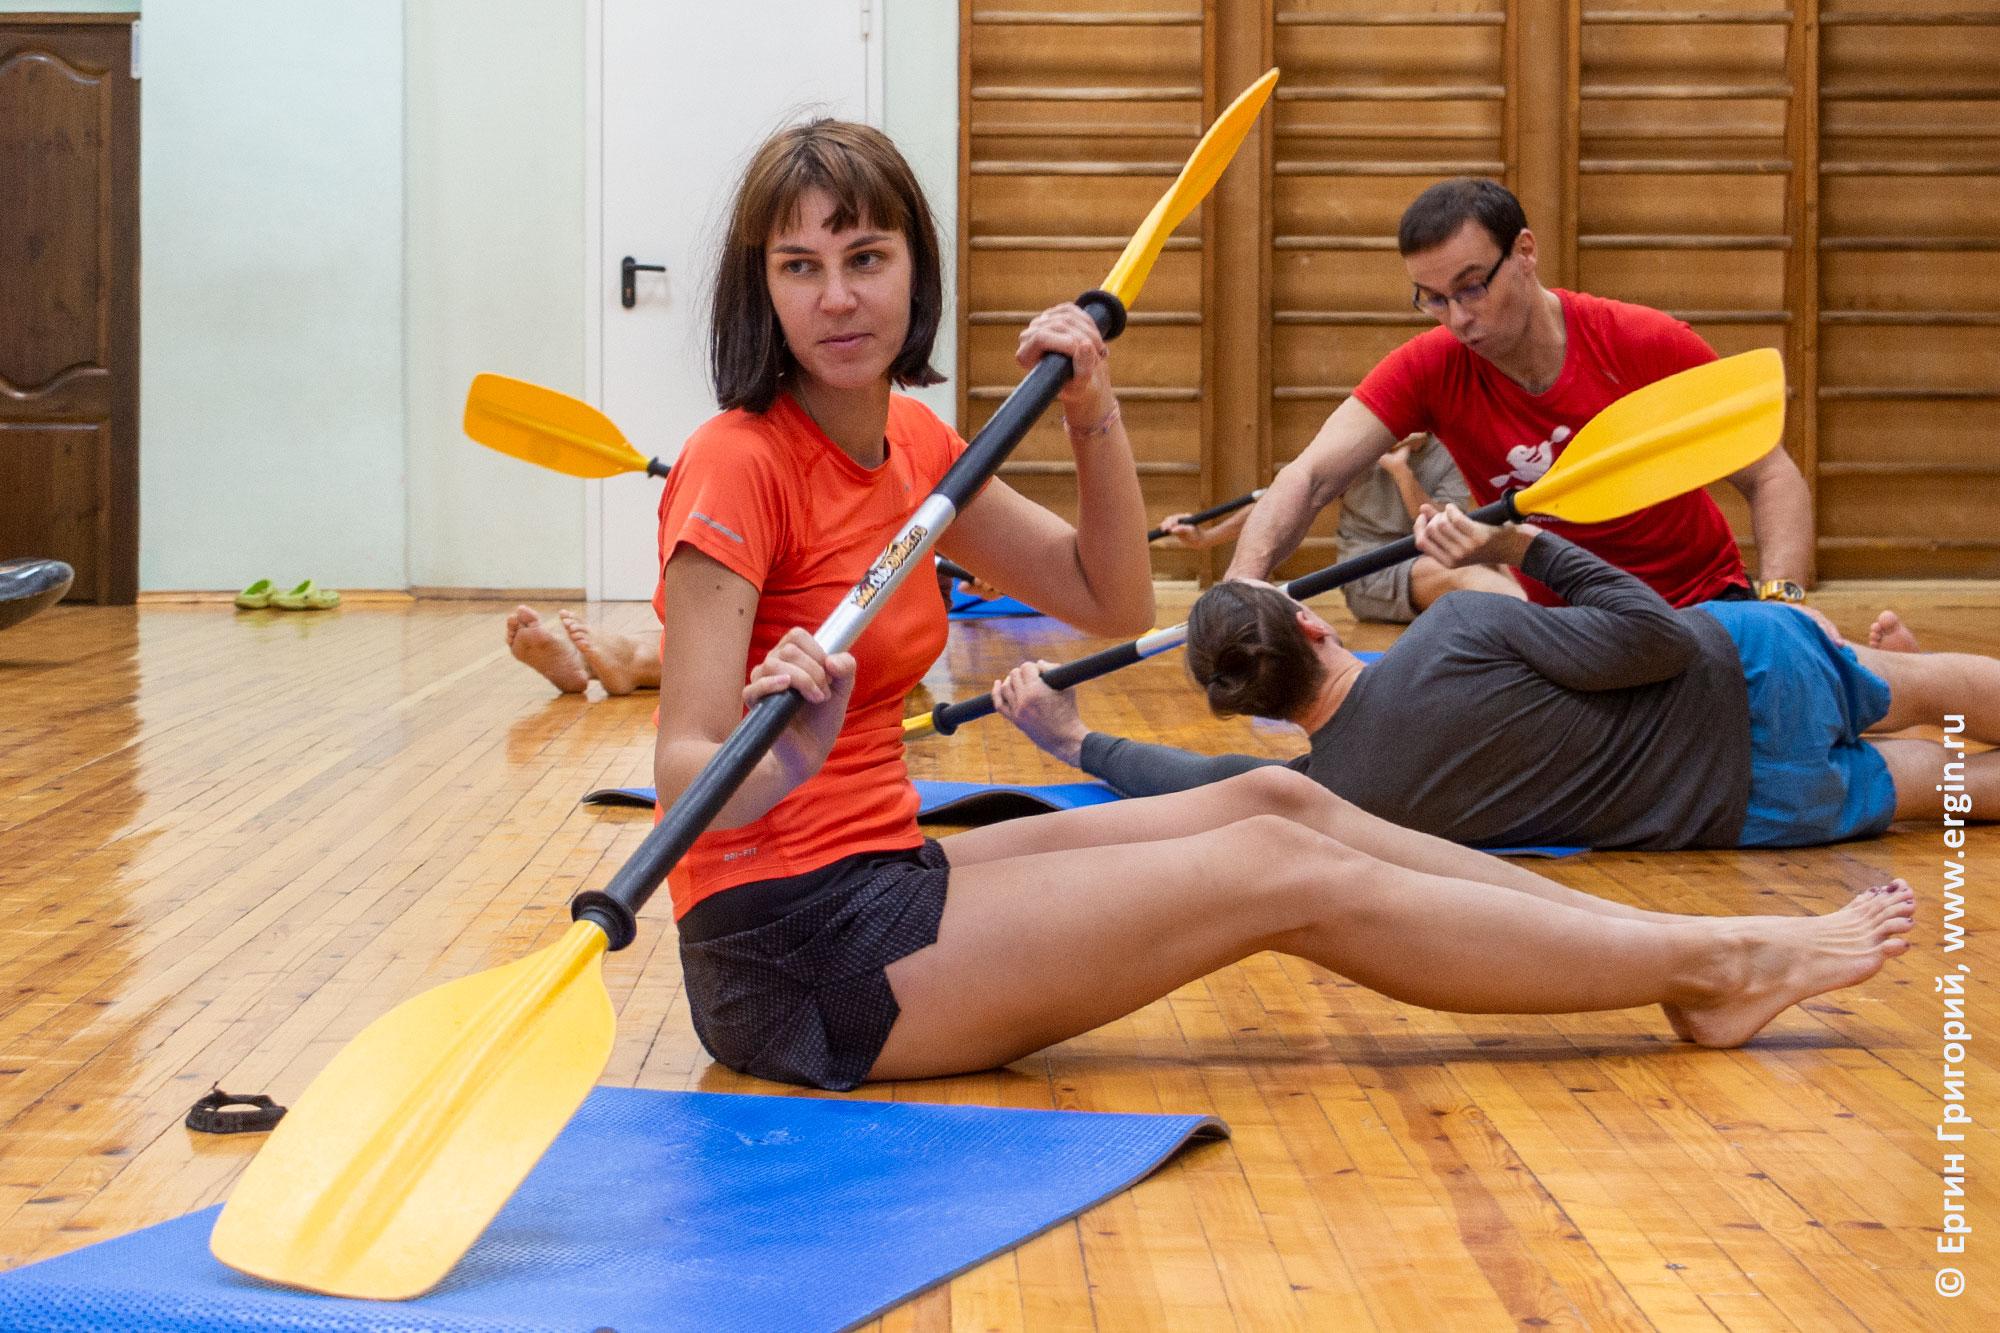 Девушка с веслом на тренировке по каякингу